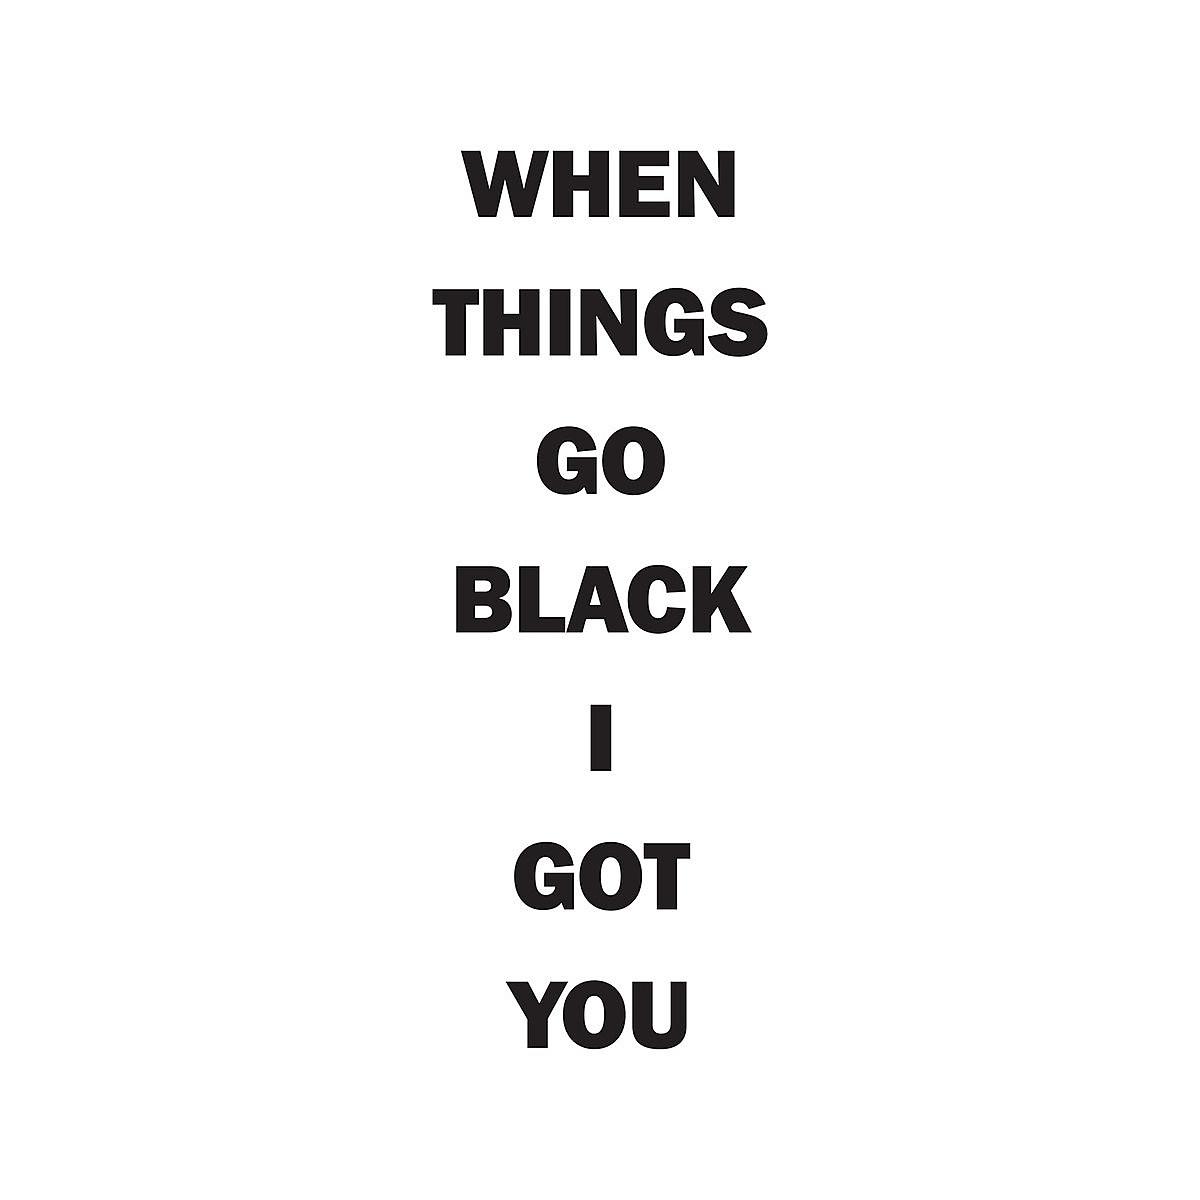 AMEN DUNES THINGS GO BLACK